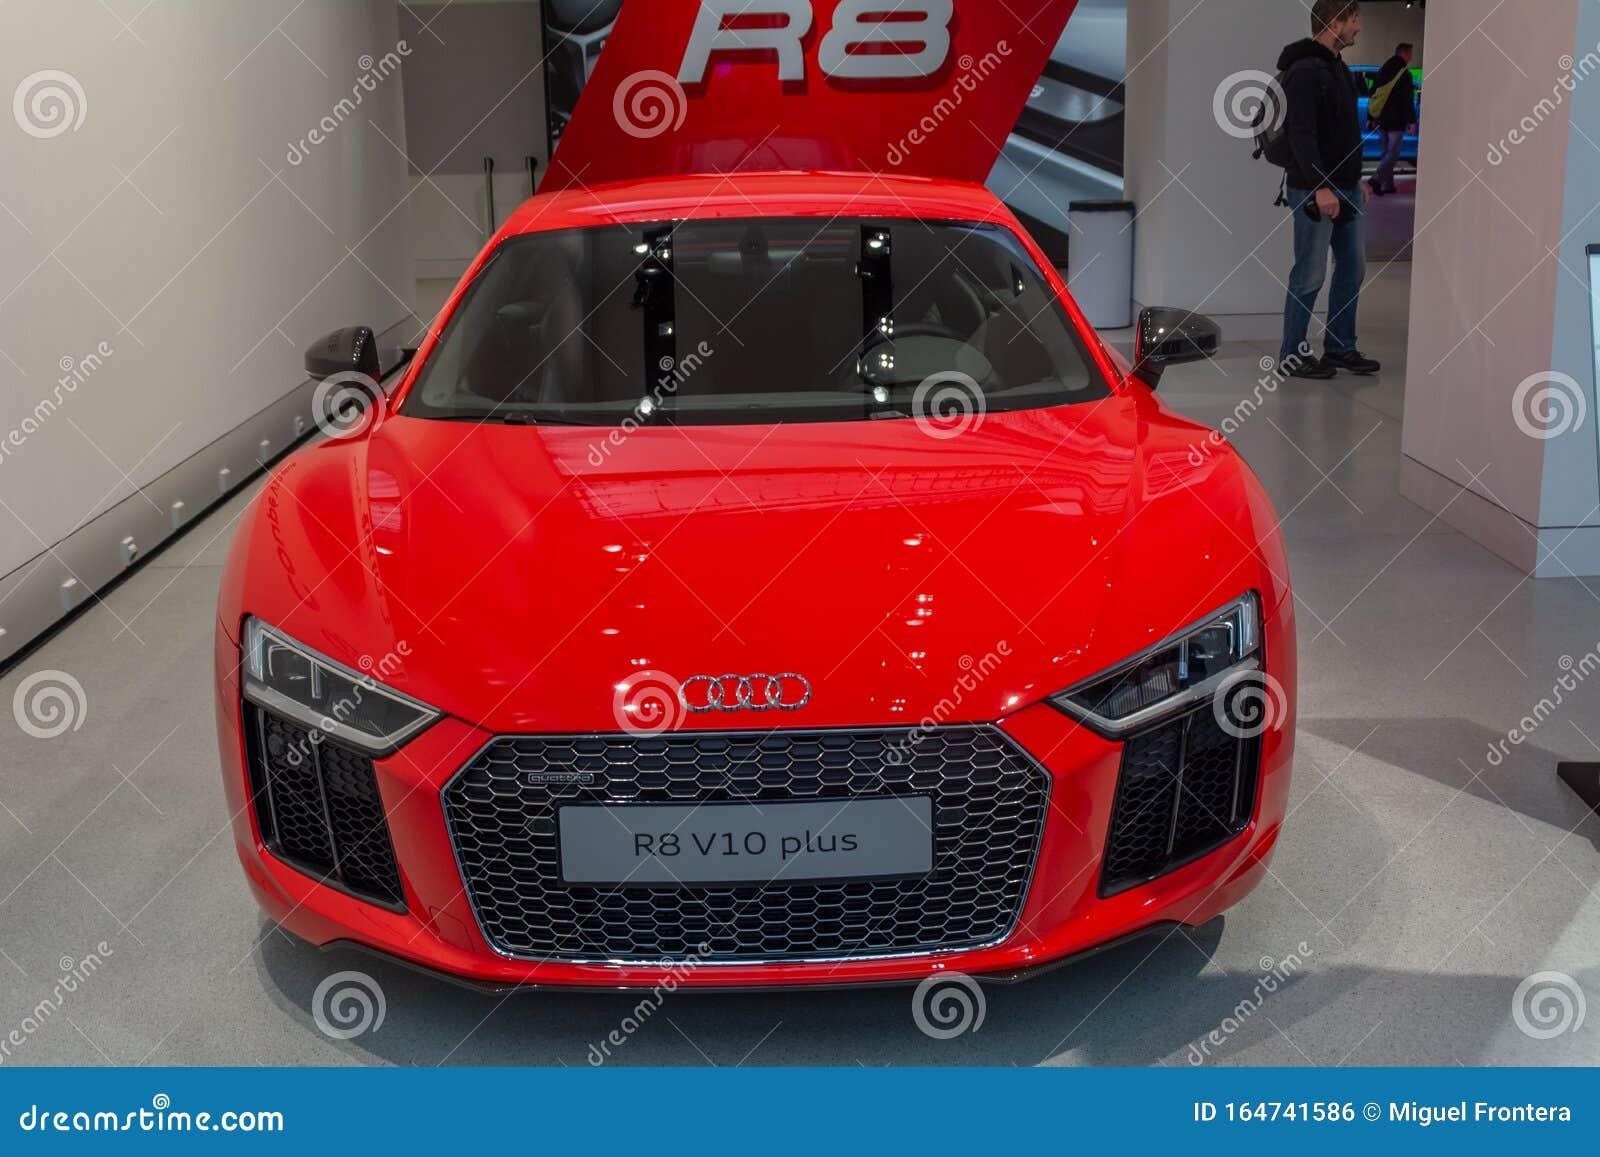 Audi R8 V10 In The Volkswagen Forum Berlin Editorial Photo Image Of International Automotive 164741586